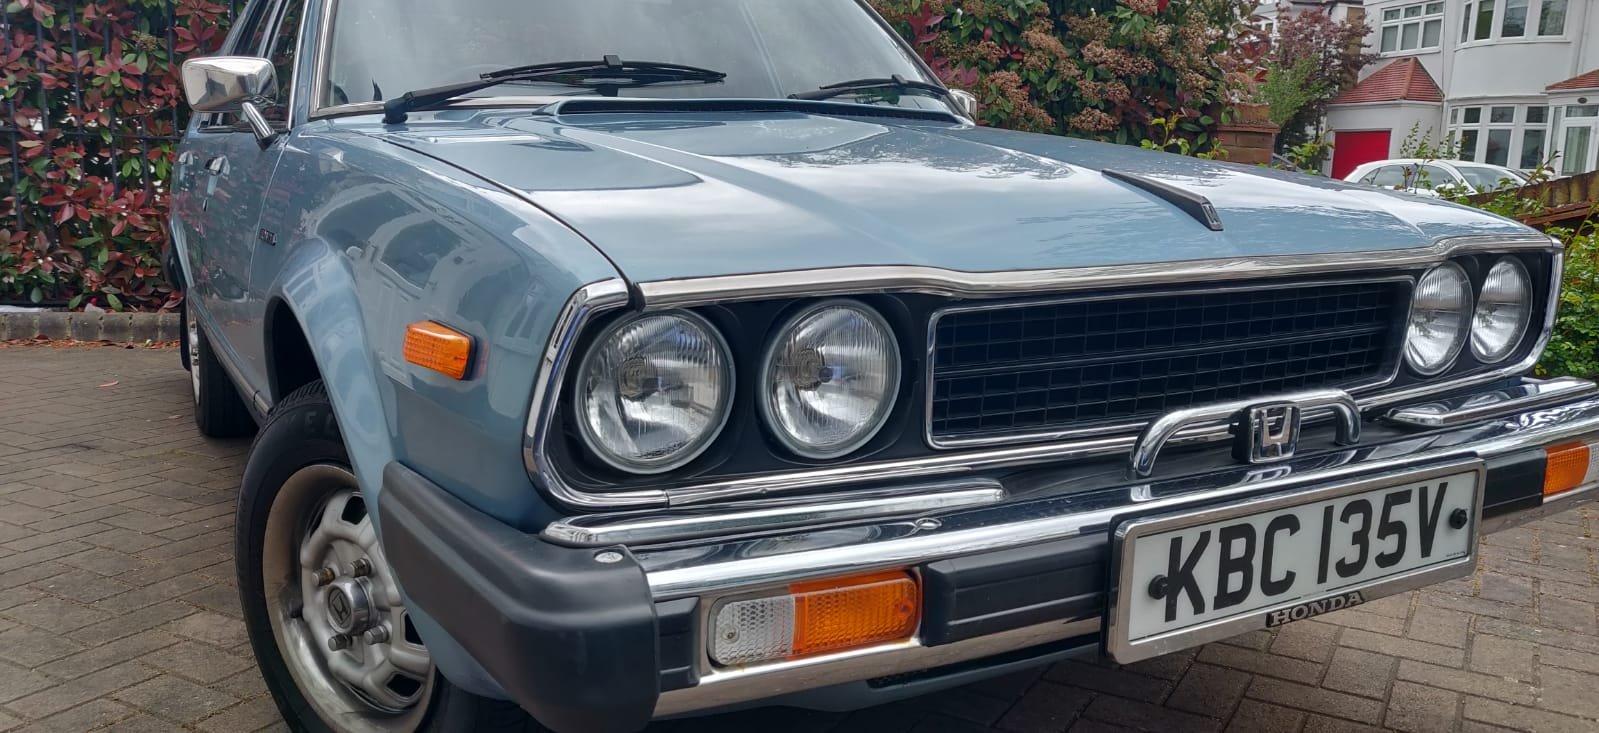 1980 honda accord 4 door auto For Sale (picture 1 of 6)